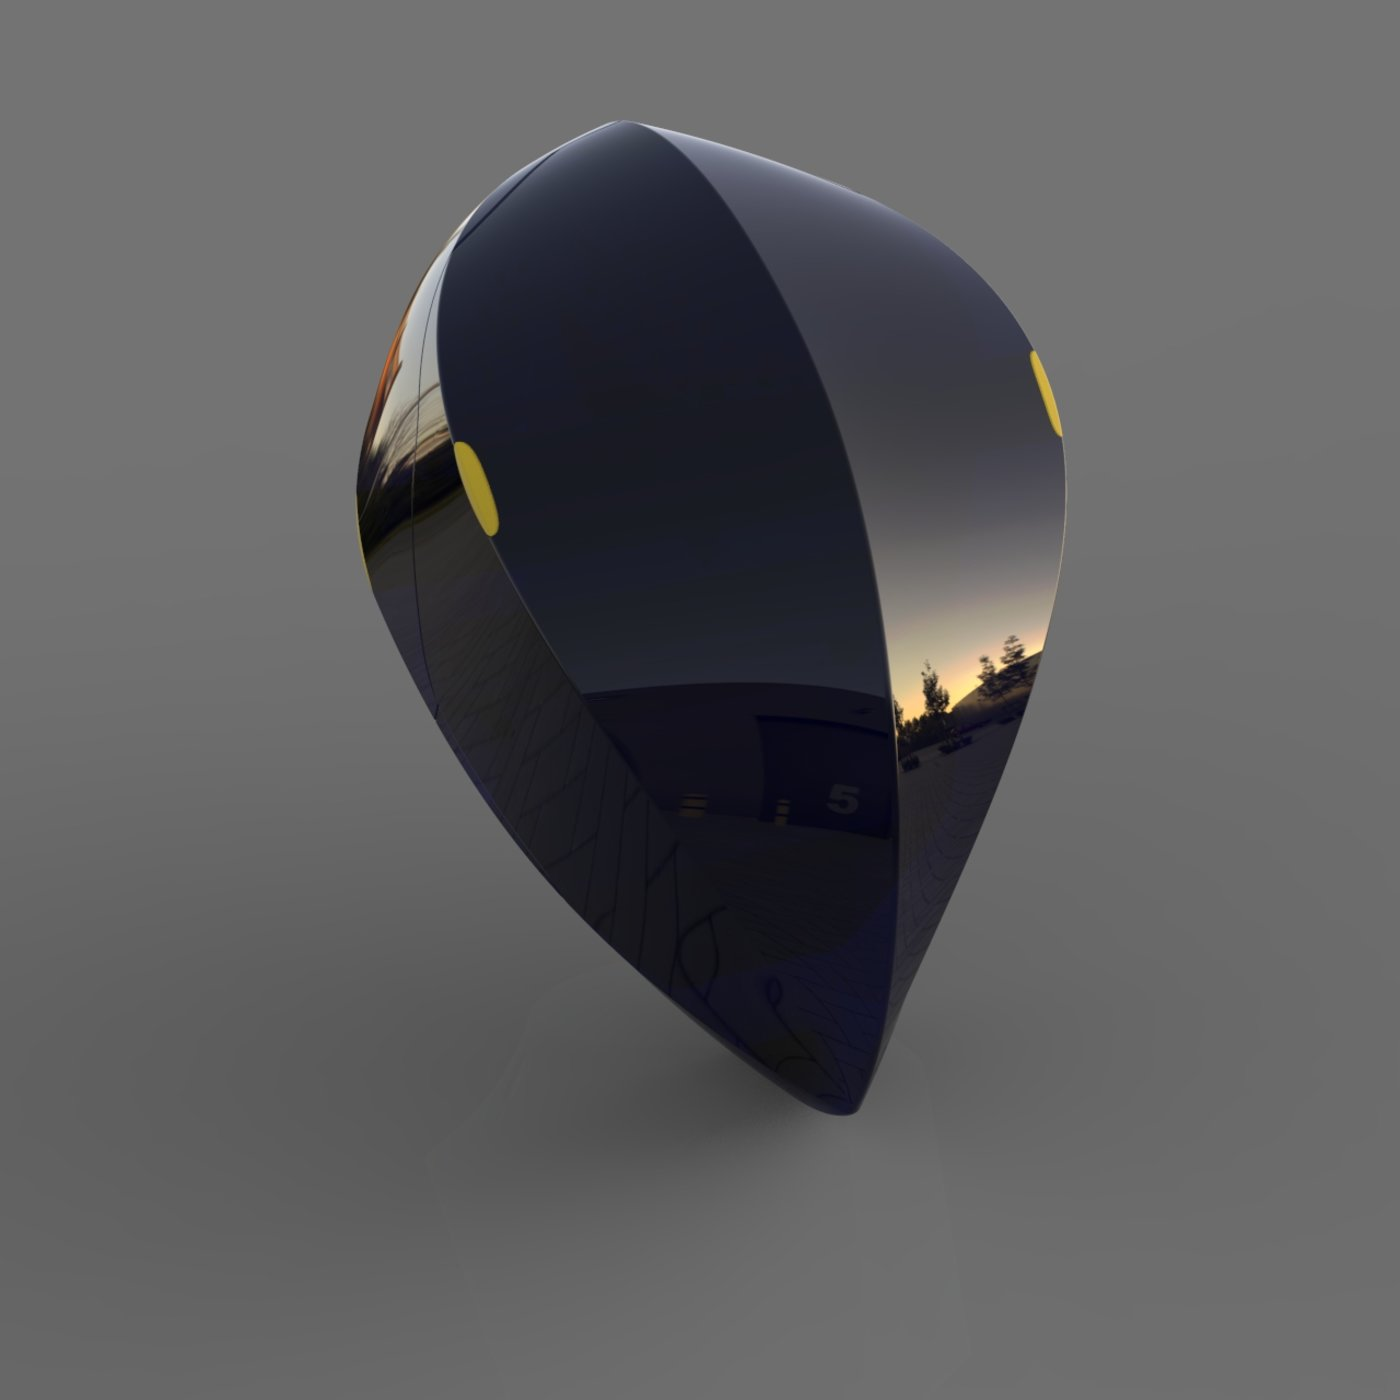 Rinzler Helmet Tron